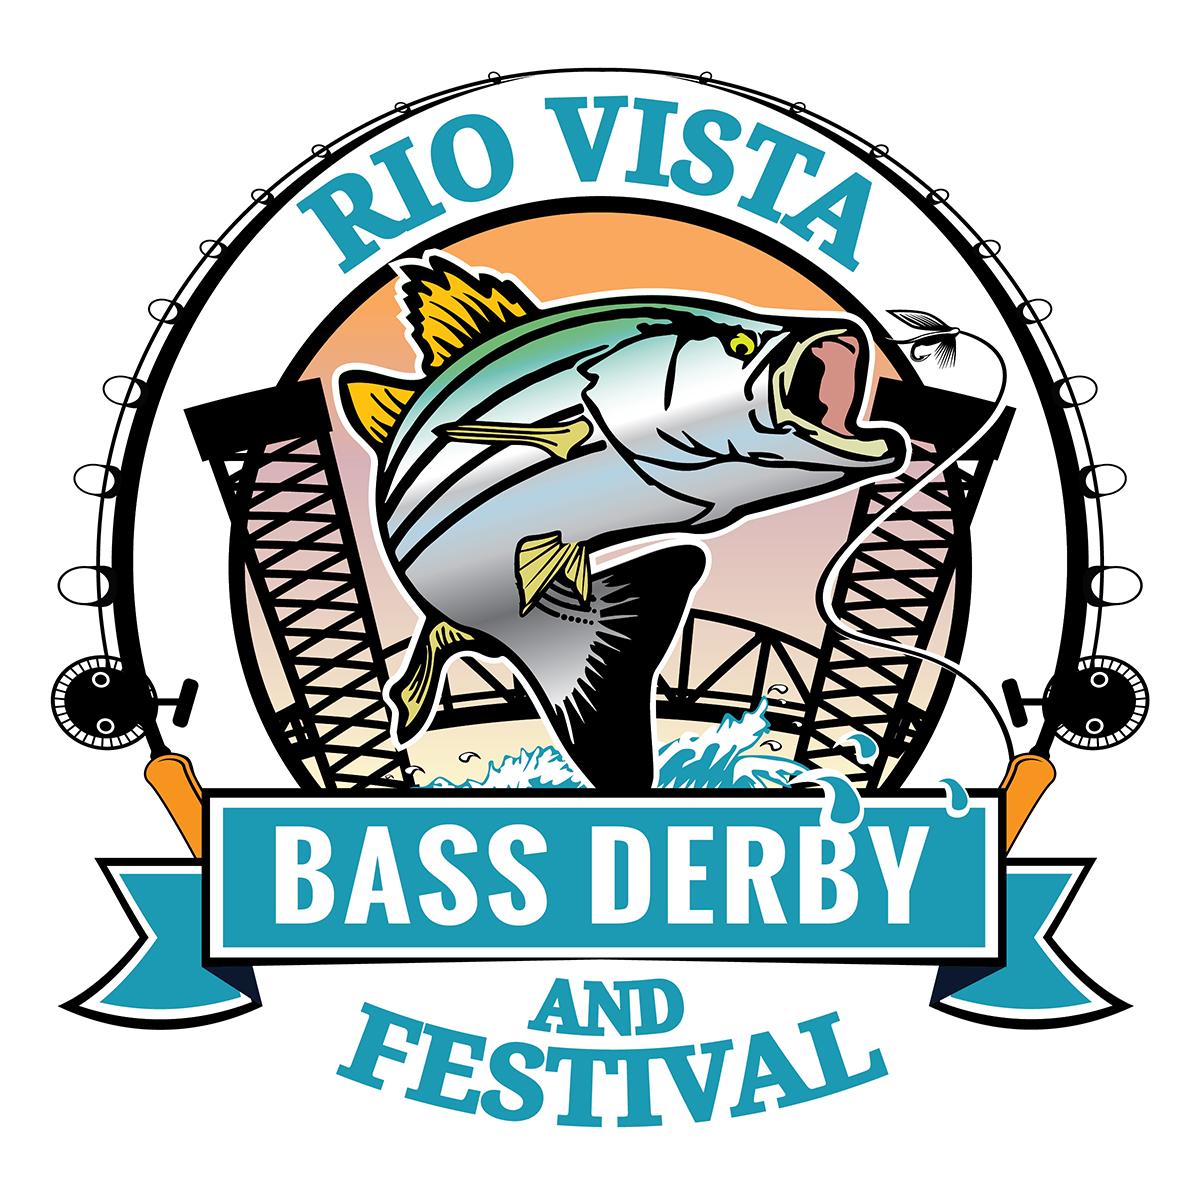 Bass-Derby-Logo-Rio-Vista.jpg